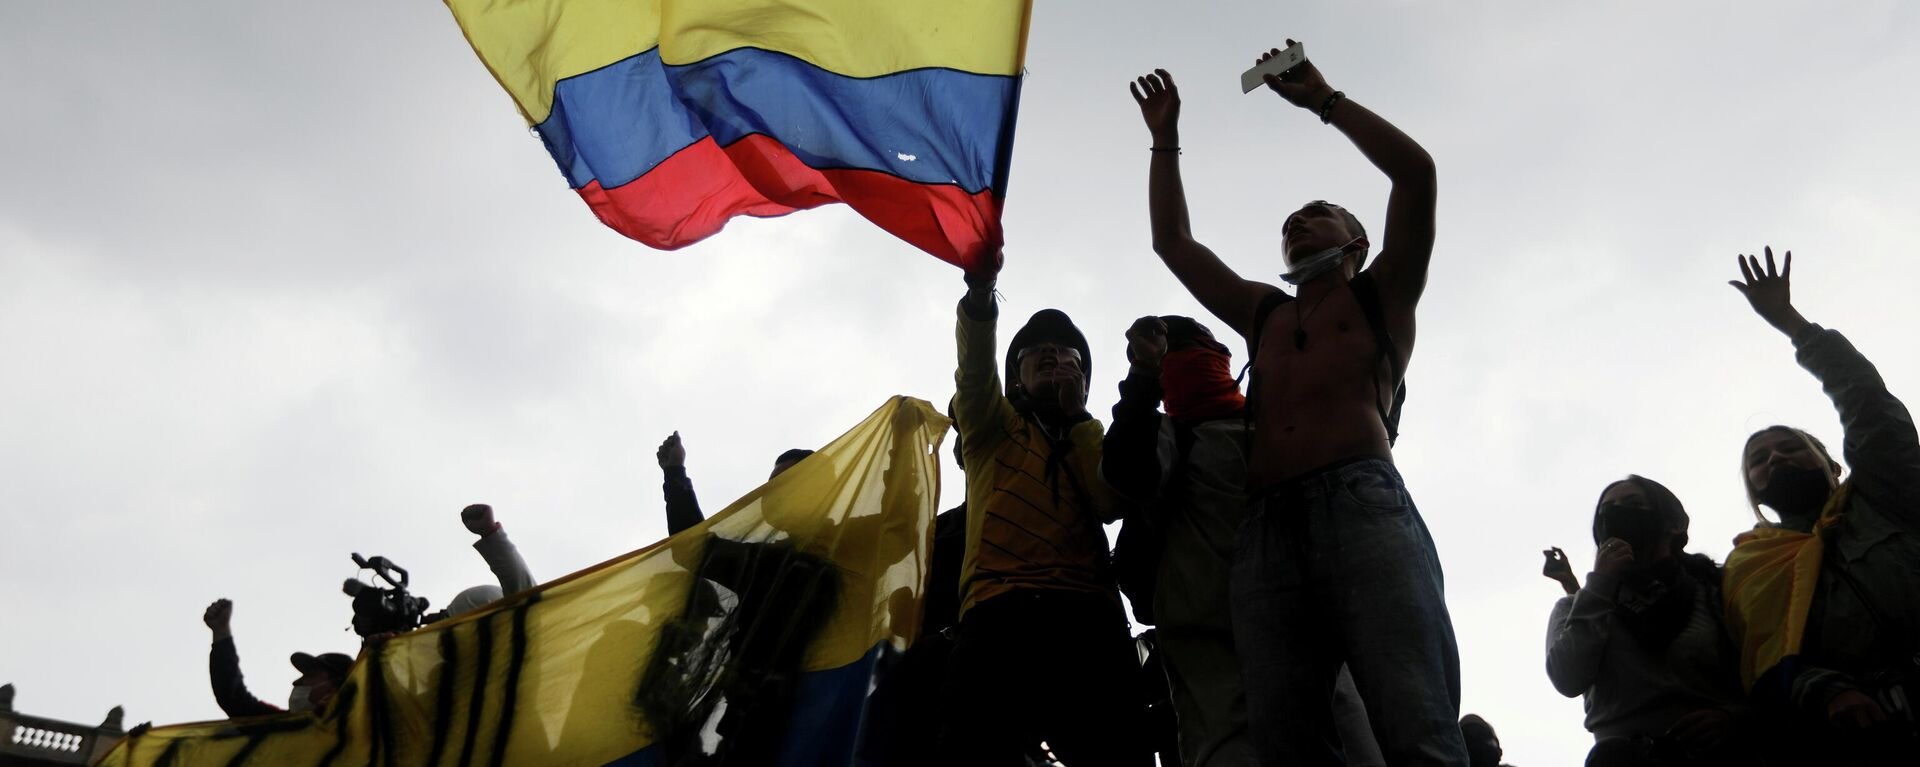 Protestas en Bogotá, Colombia - Sputnik Mundo, 1920, 03.05.2021